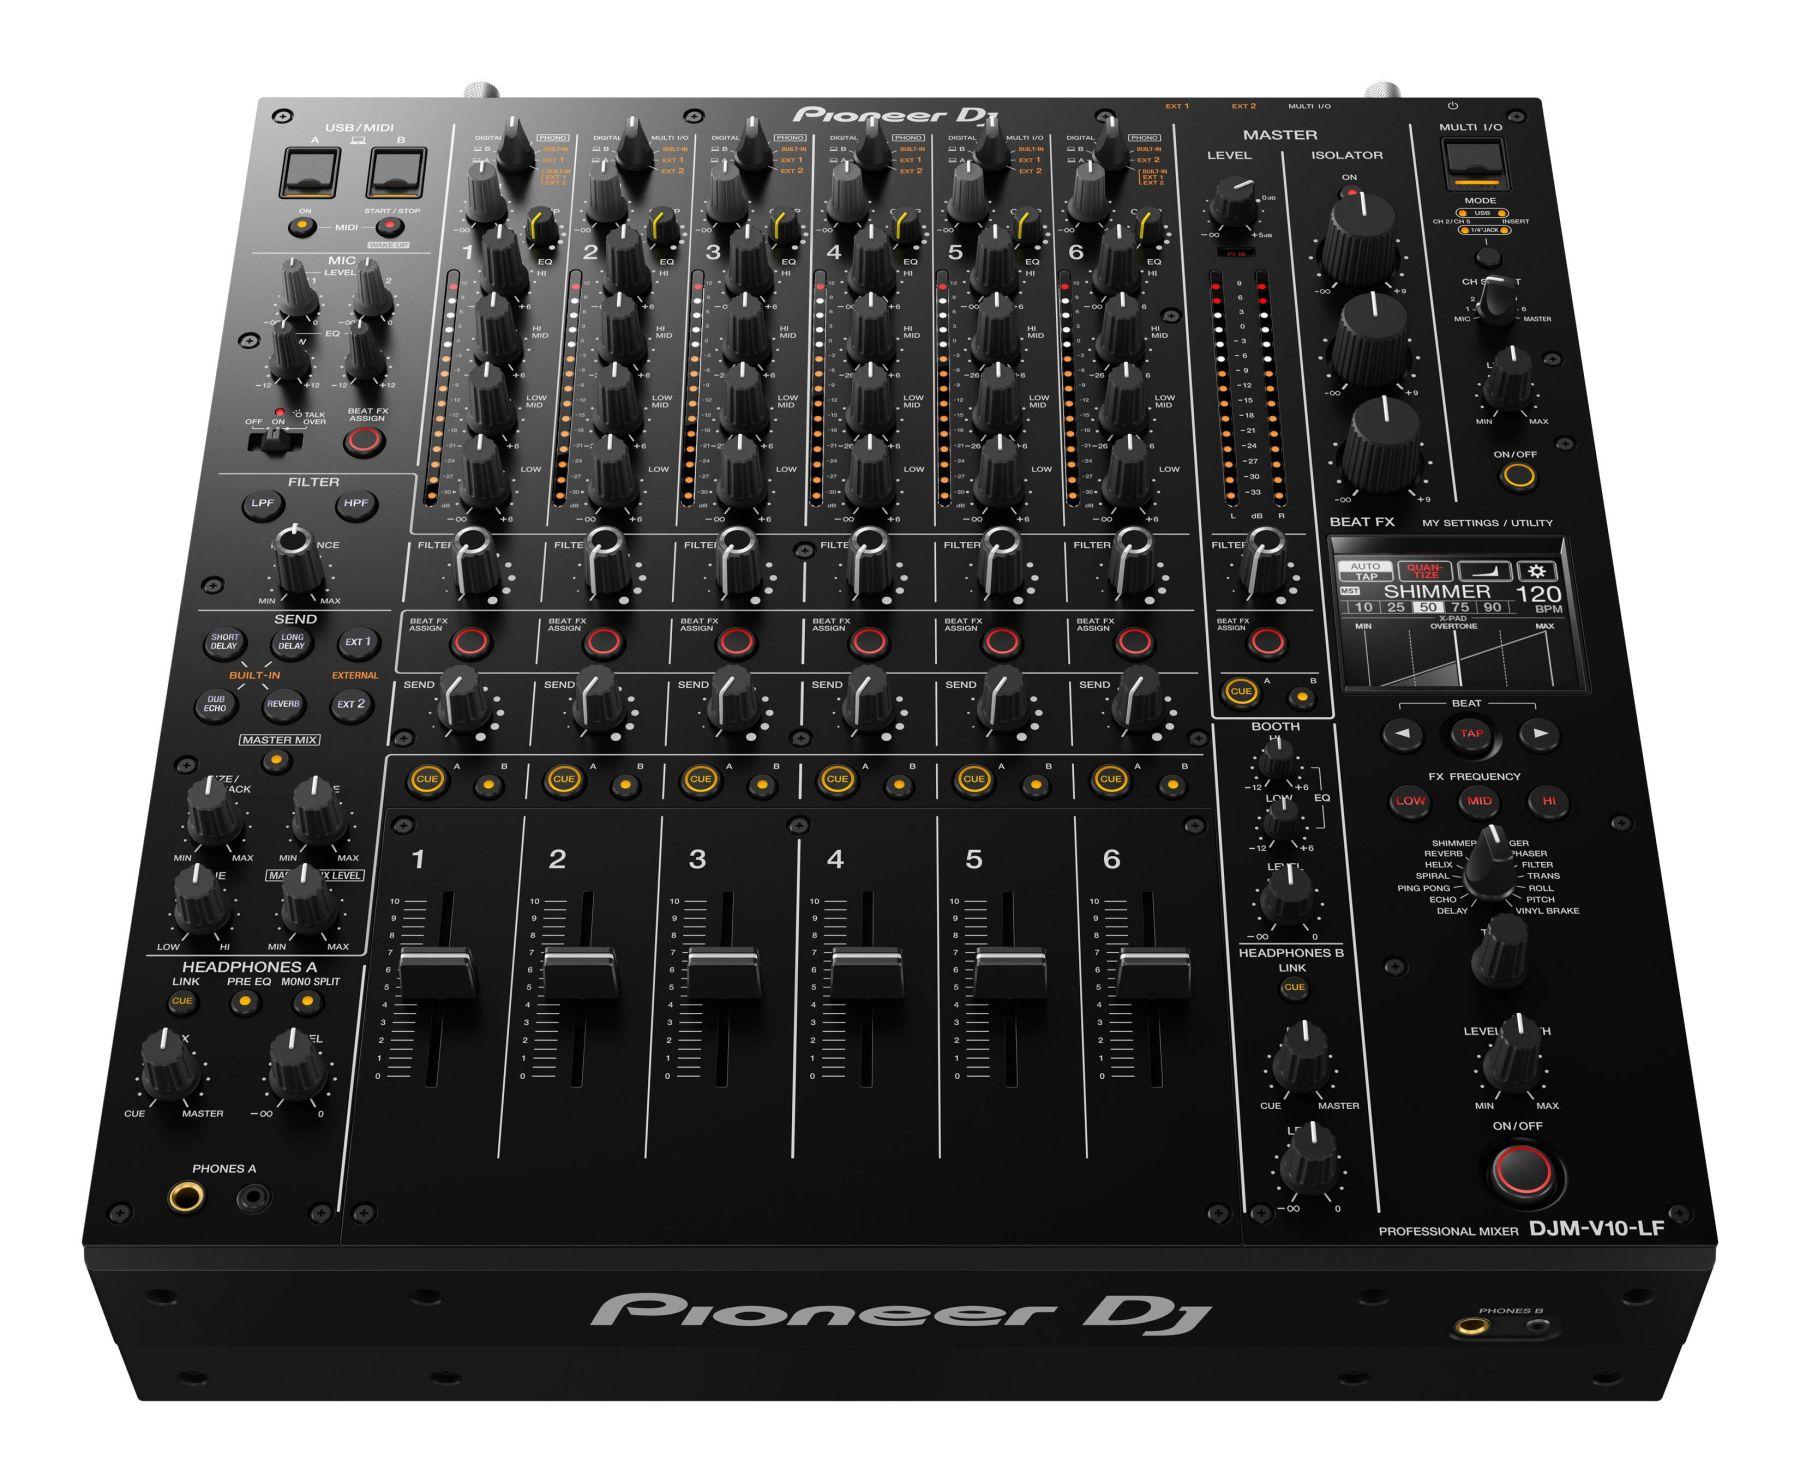 DJ-микшер Pioneer DJM-V10-LF